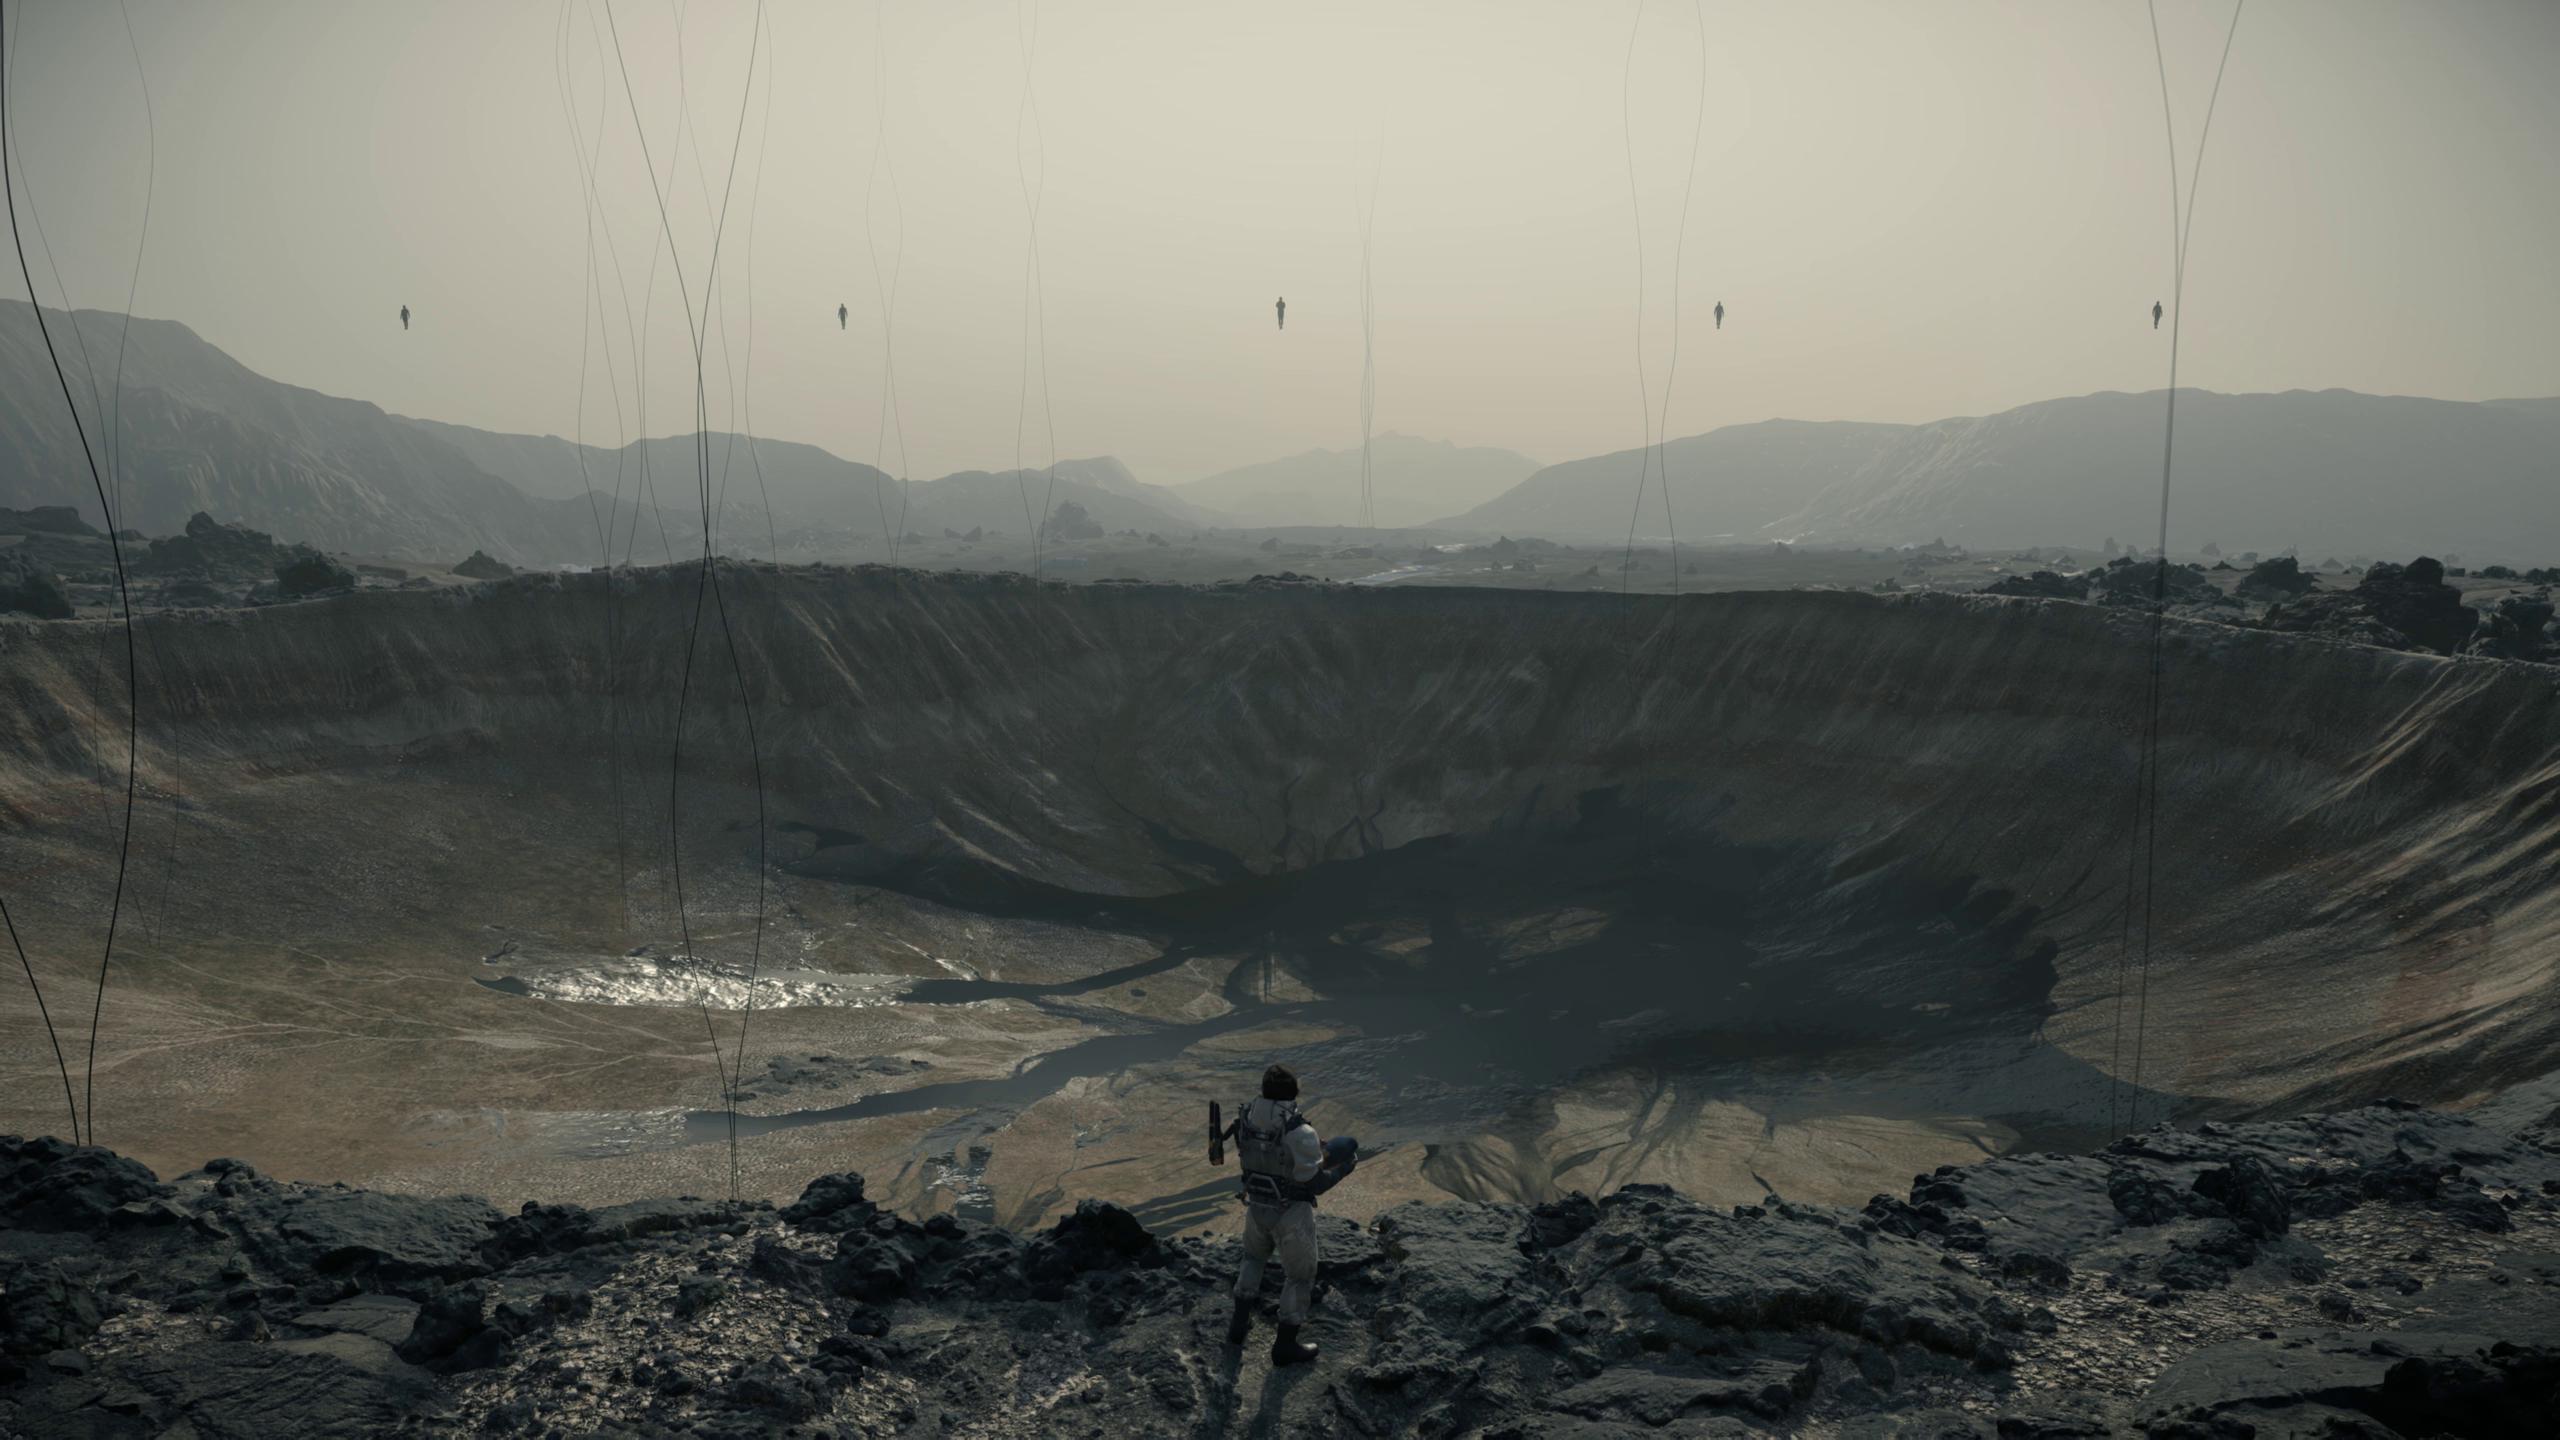 General 2560x1440 Death Stranding Hideo Kojima crater video games